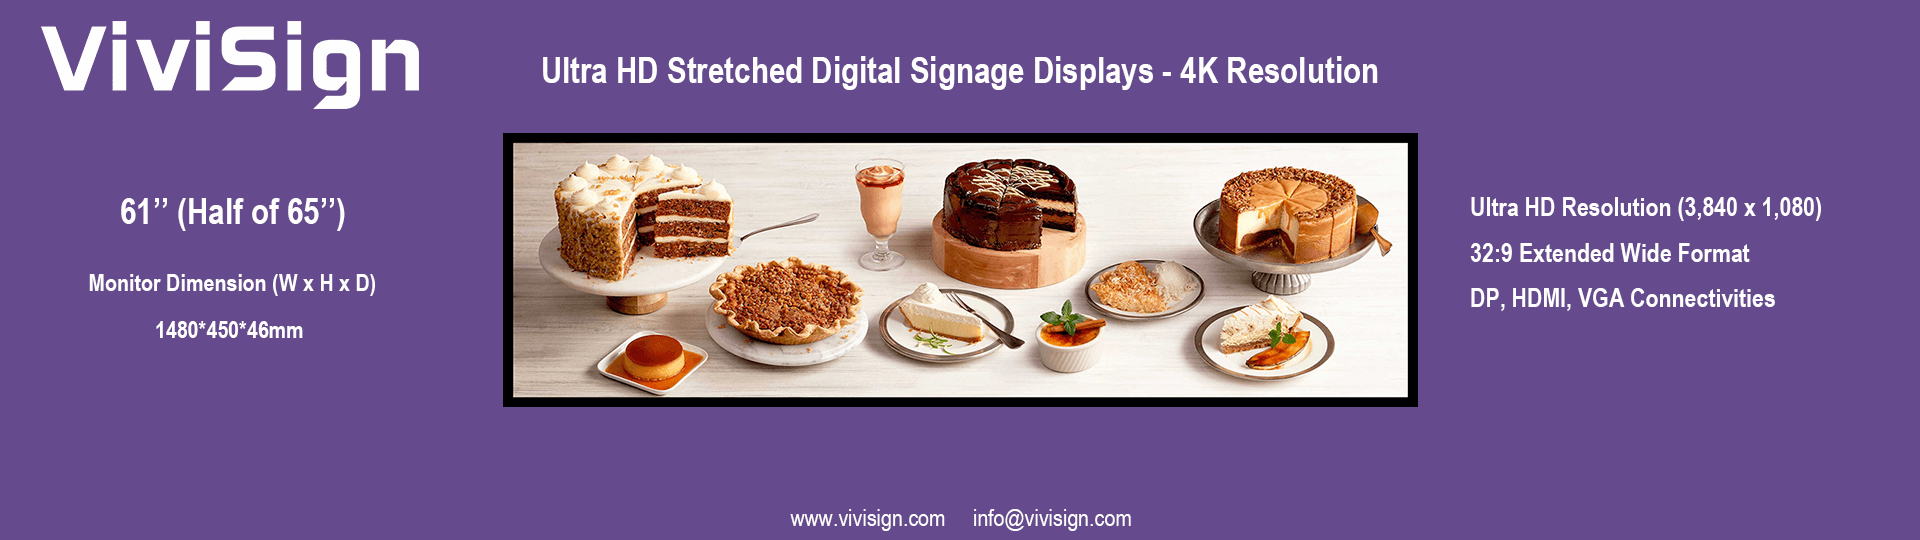 4K Stretched Displays